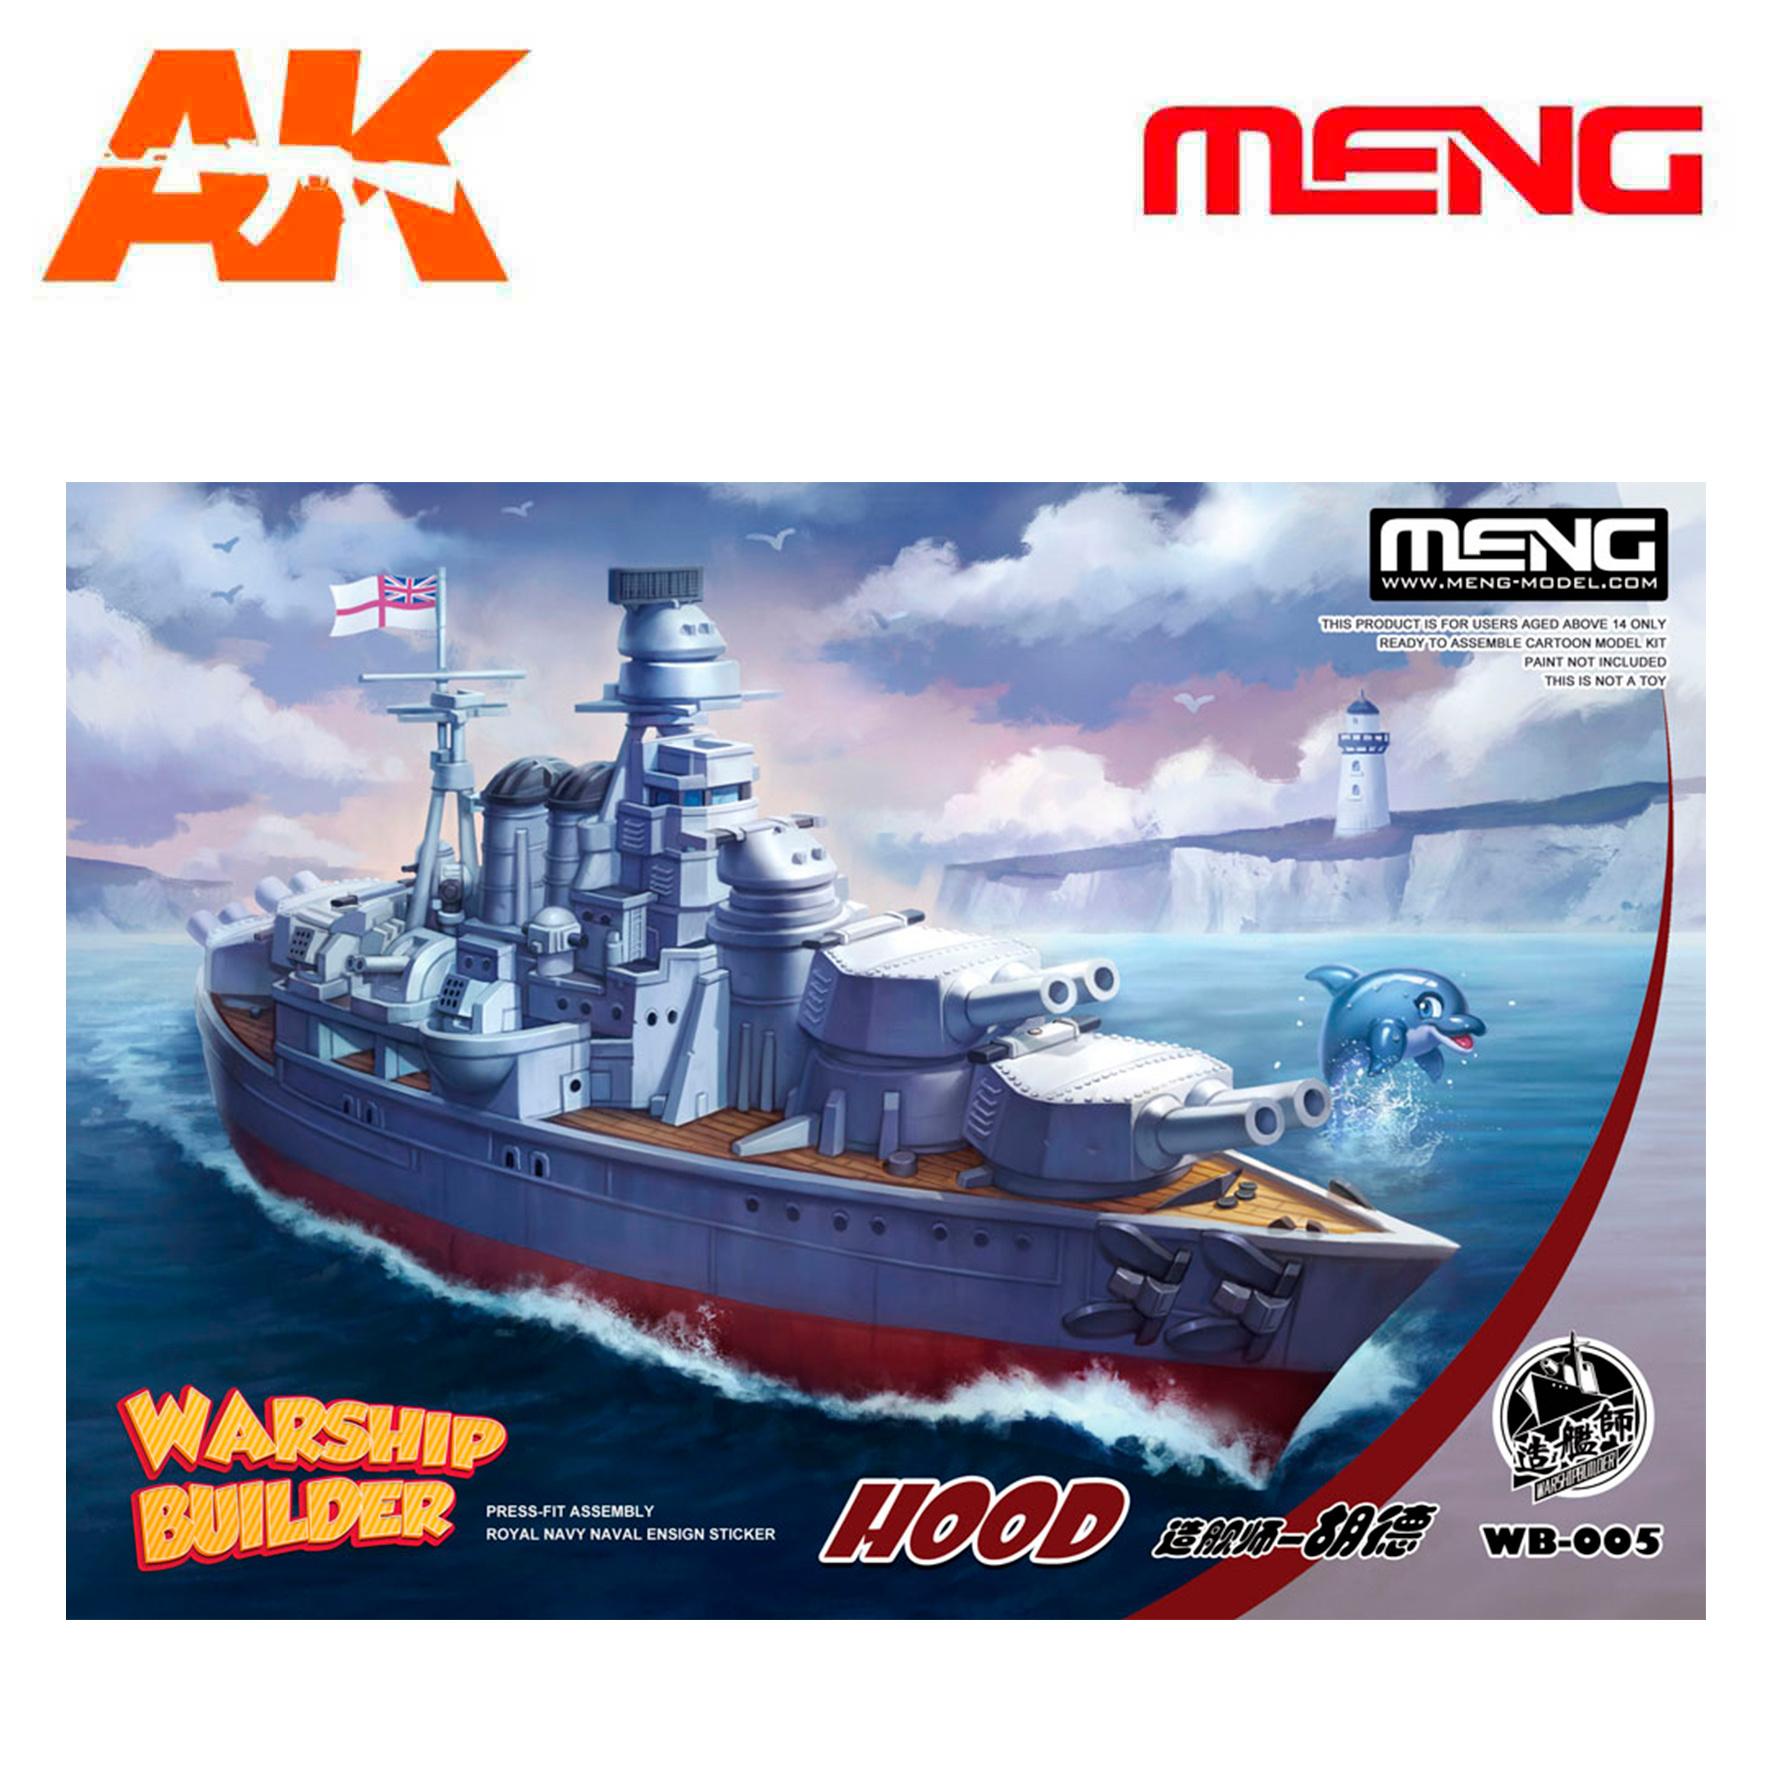 Meng Models Warship Builder Hood - Cartoon Model - Meng Models - MM WB-005